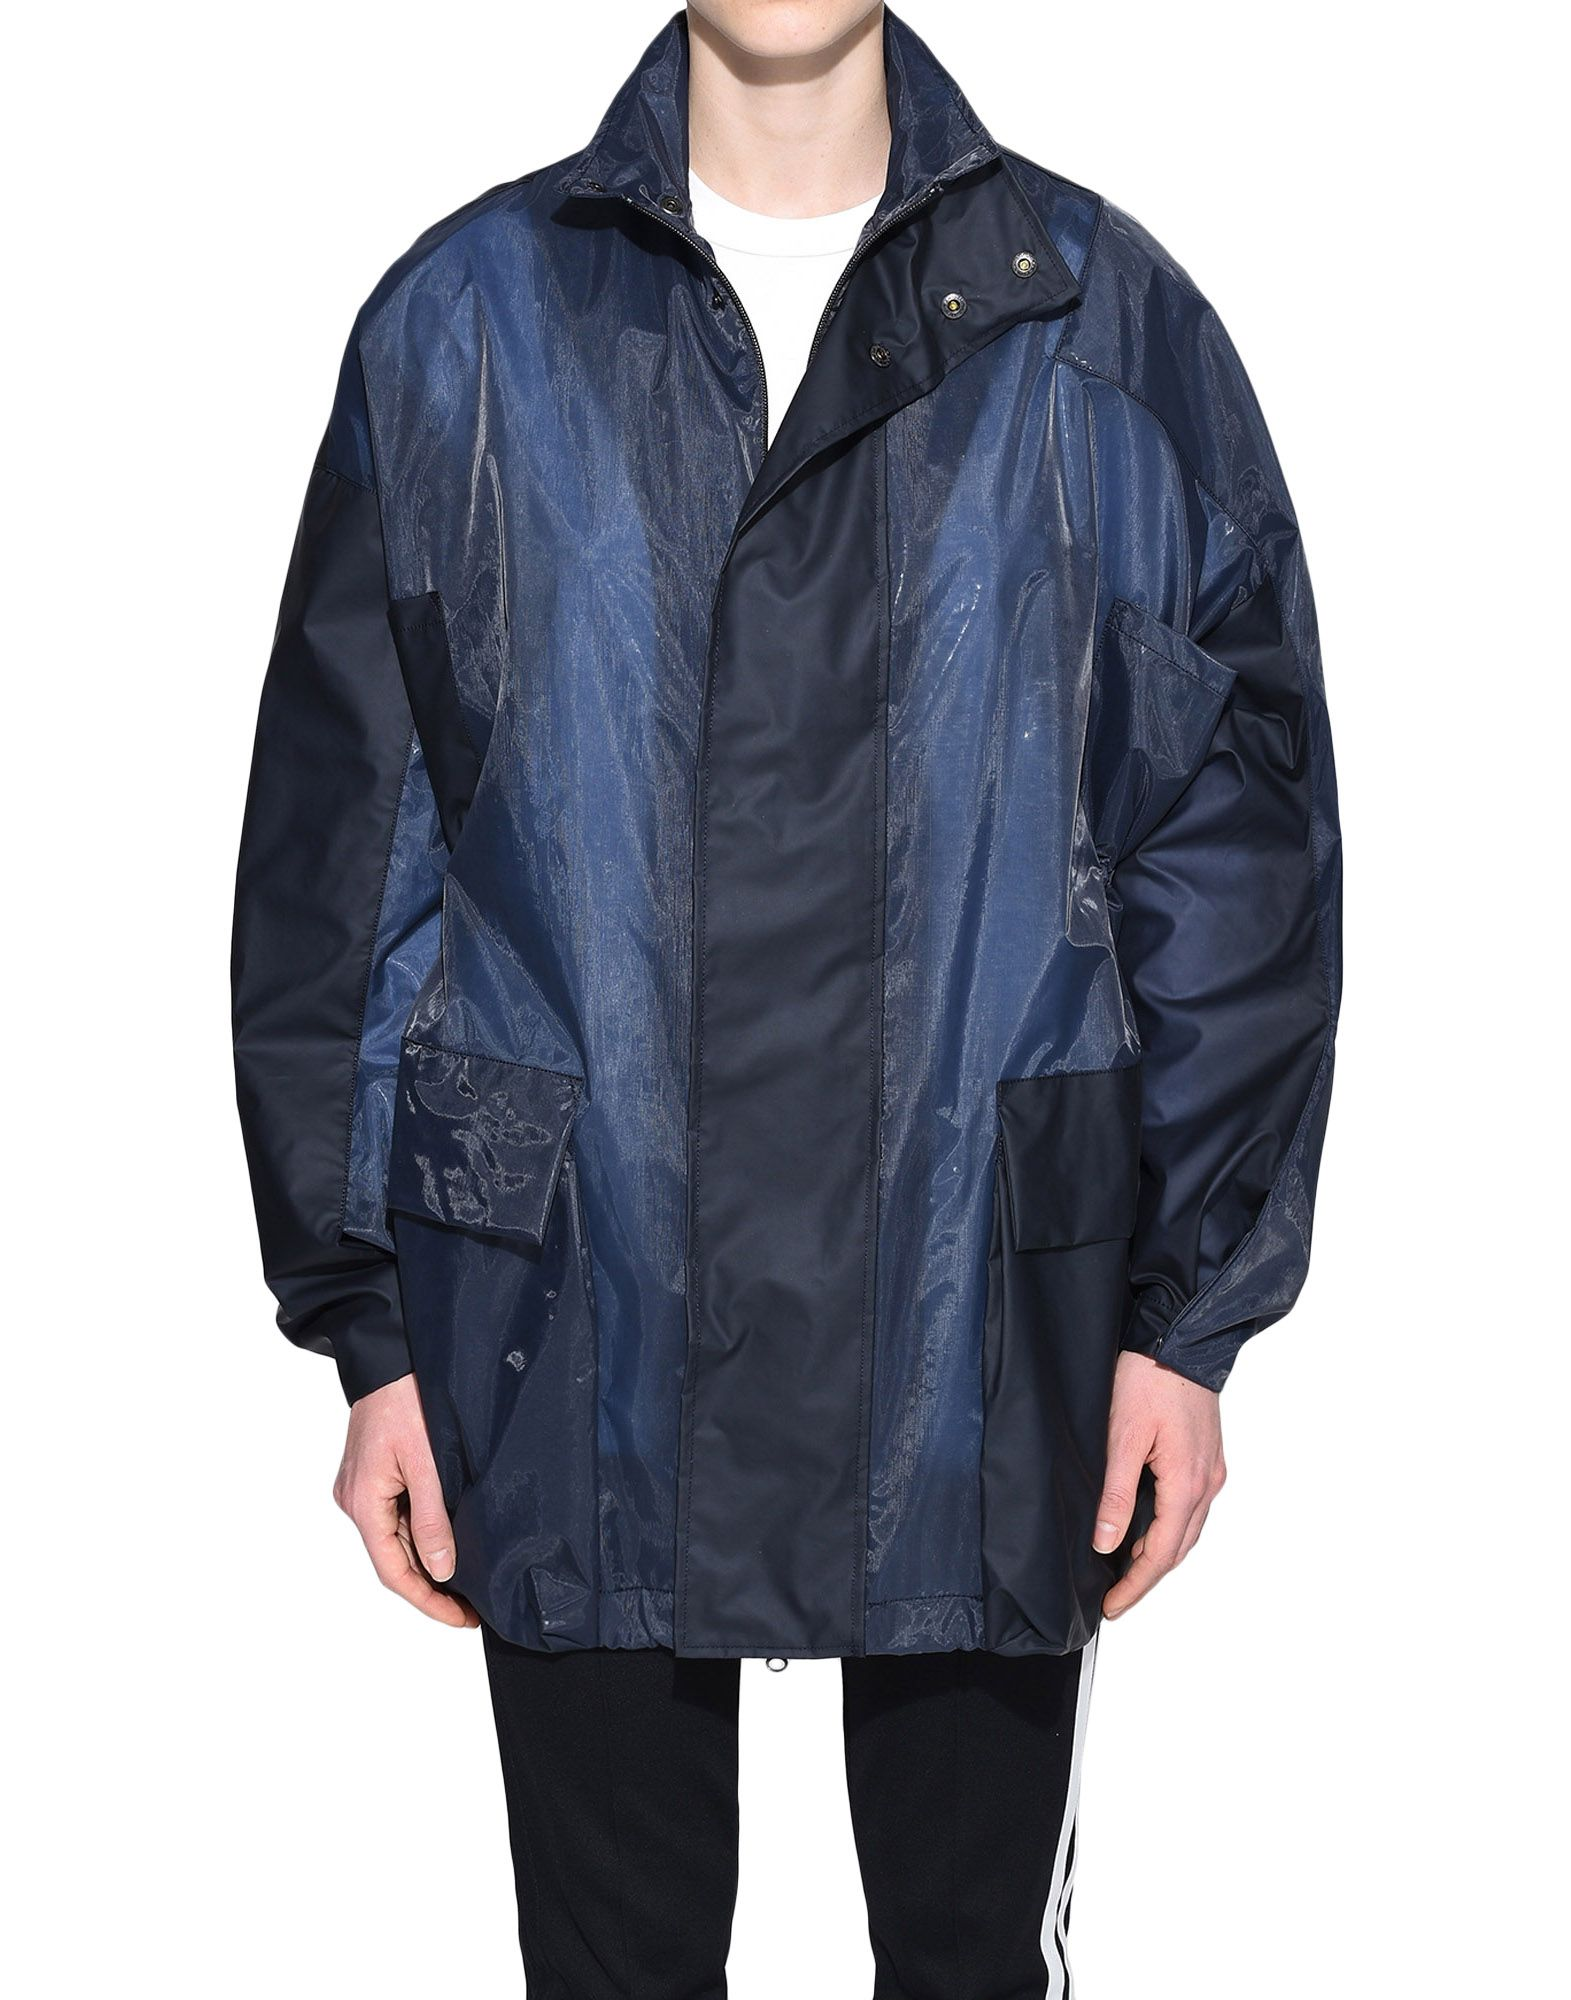 Y-3 Y-3 Patchwork Anorak Jacket Jacket Woman r